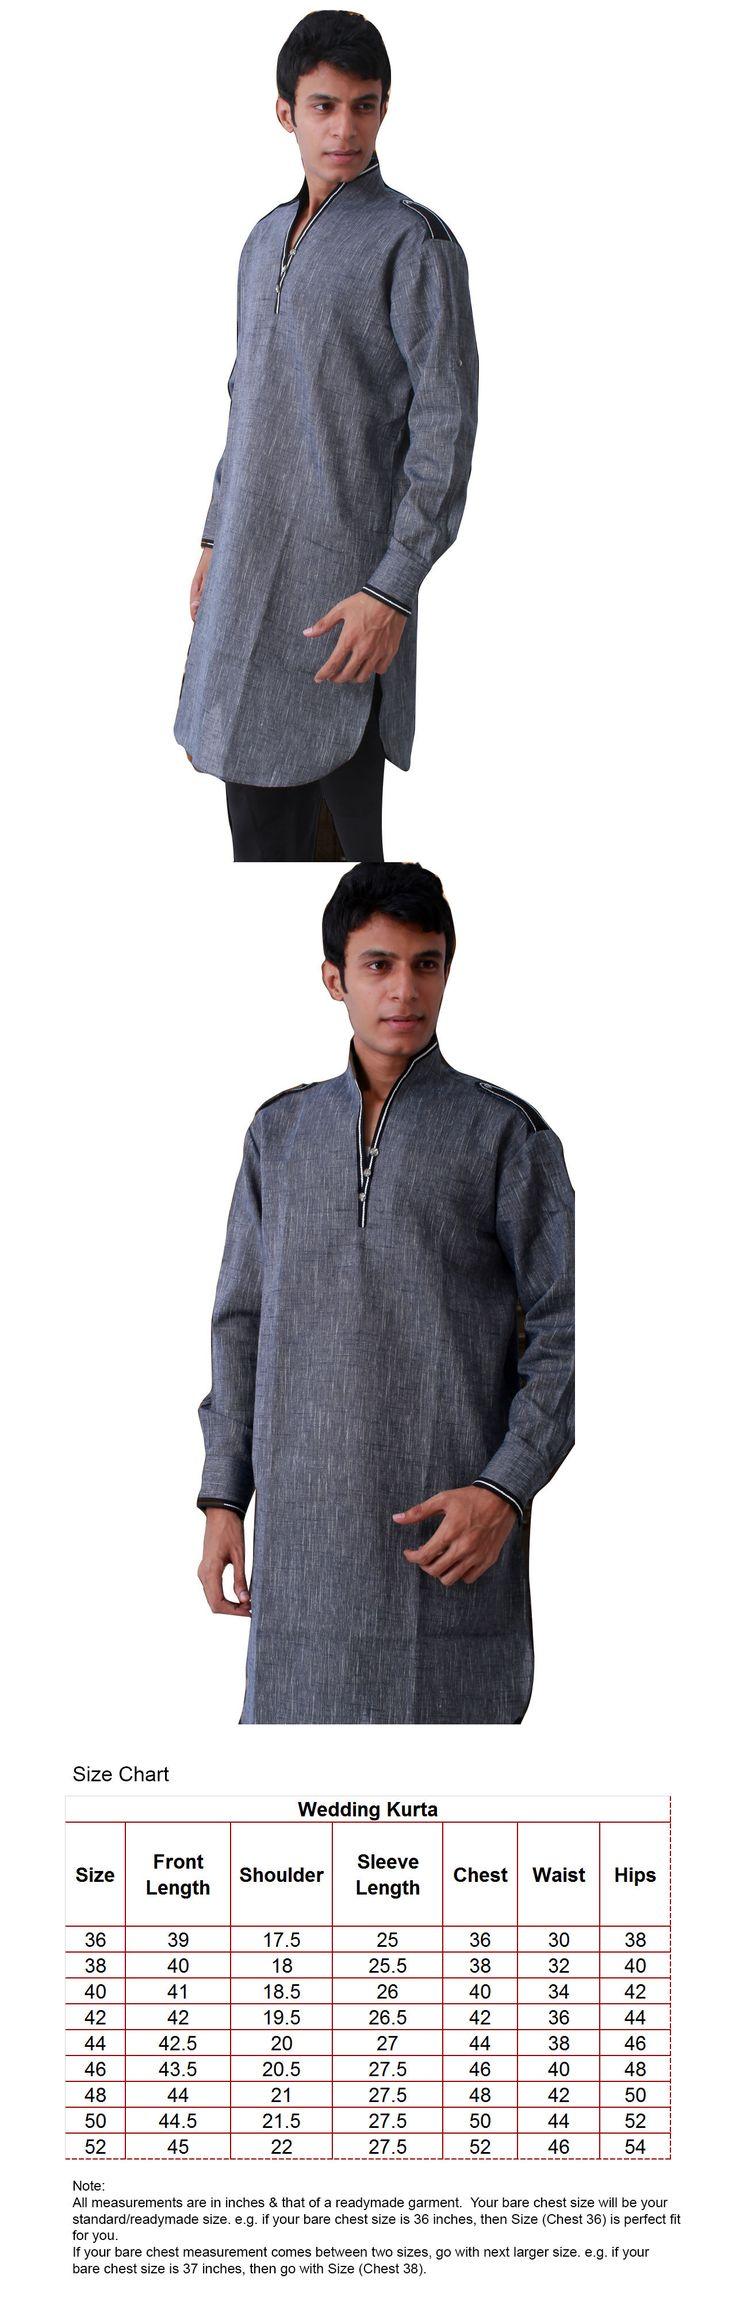 Kurta 155248: Party Wear Pathani Indian Kurta Pajama Sherwani Set For Men -> BUY IT NOW ONLY: $124 on eBay!